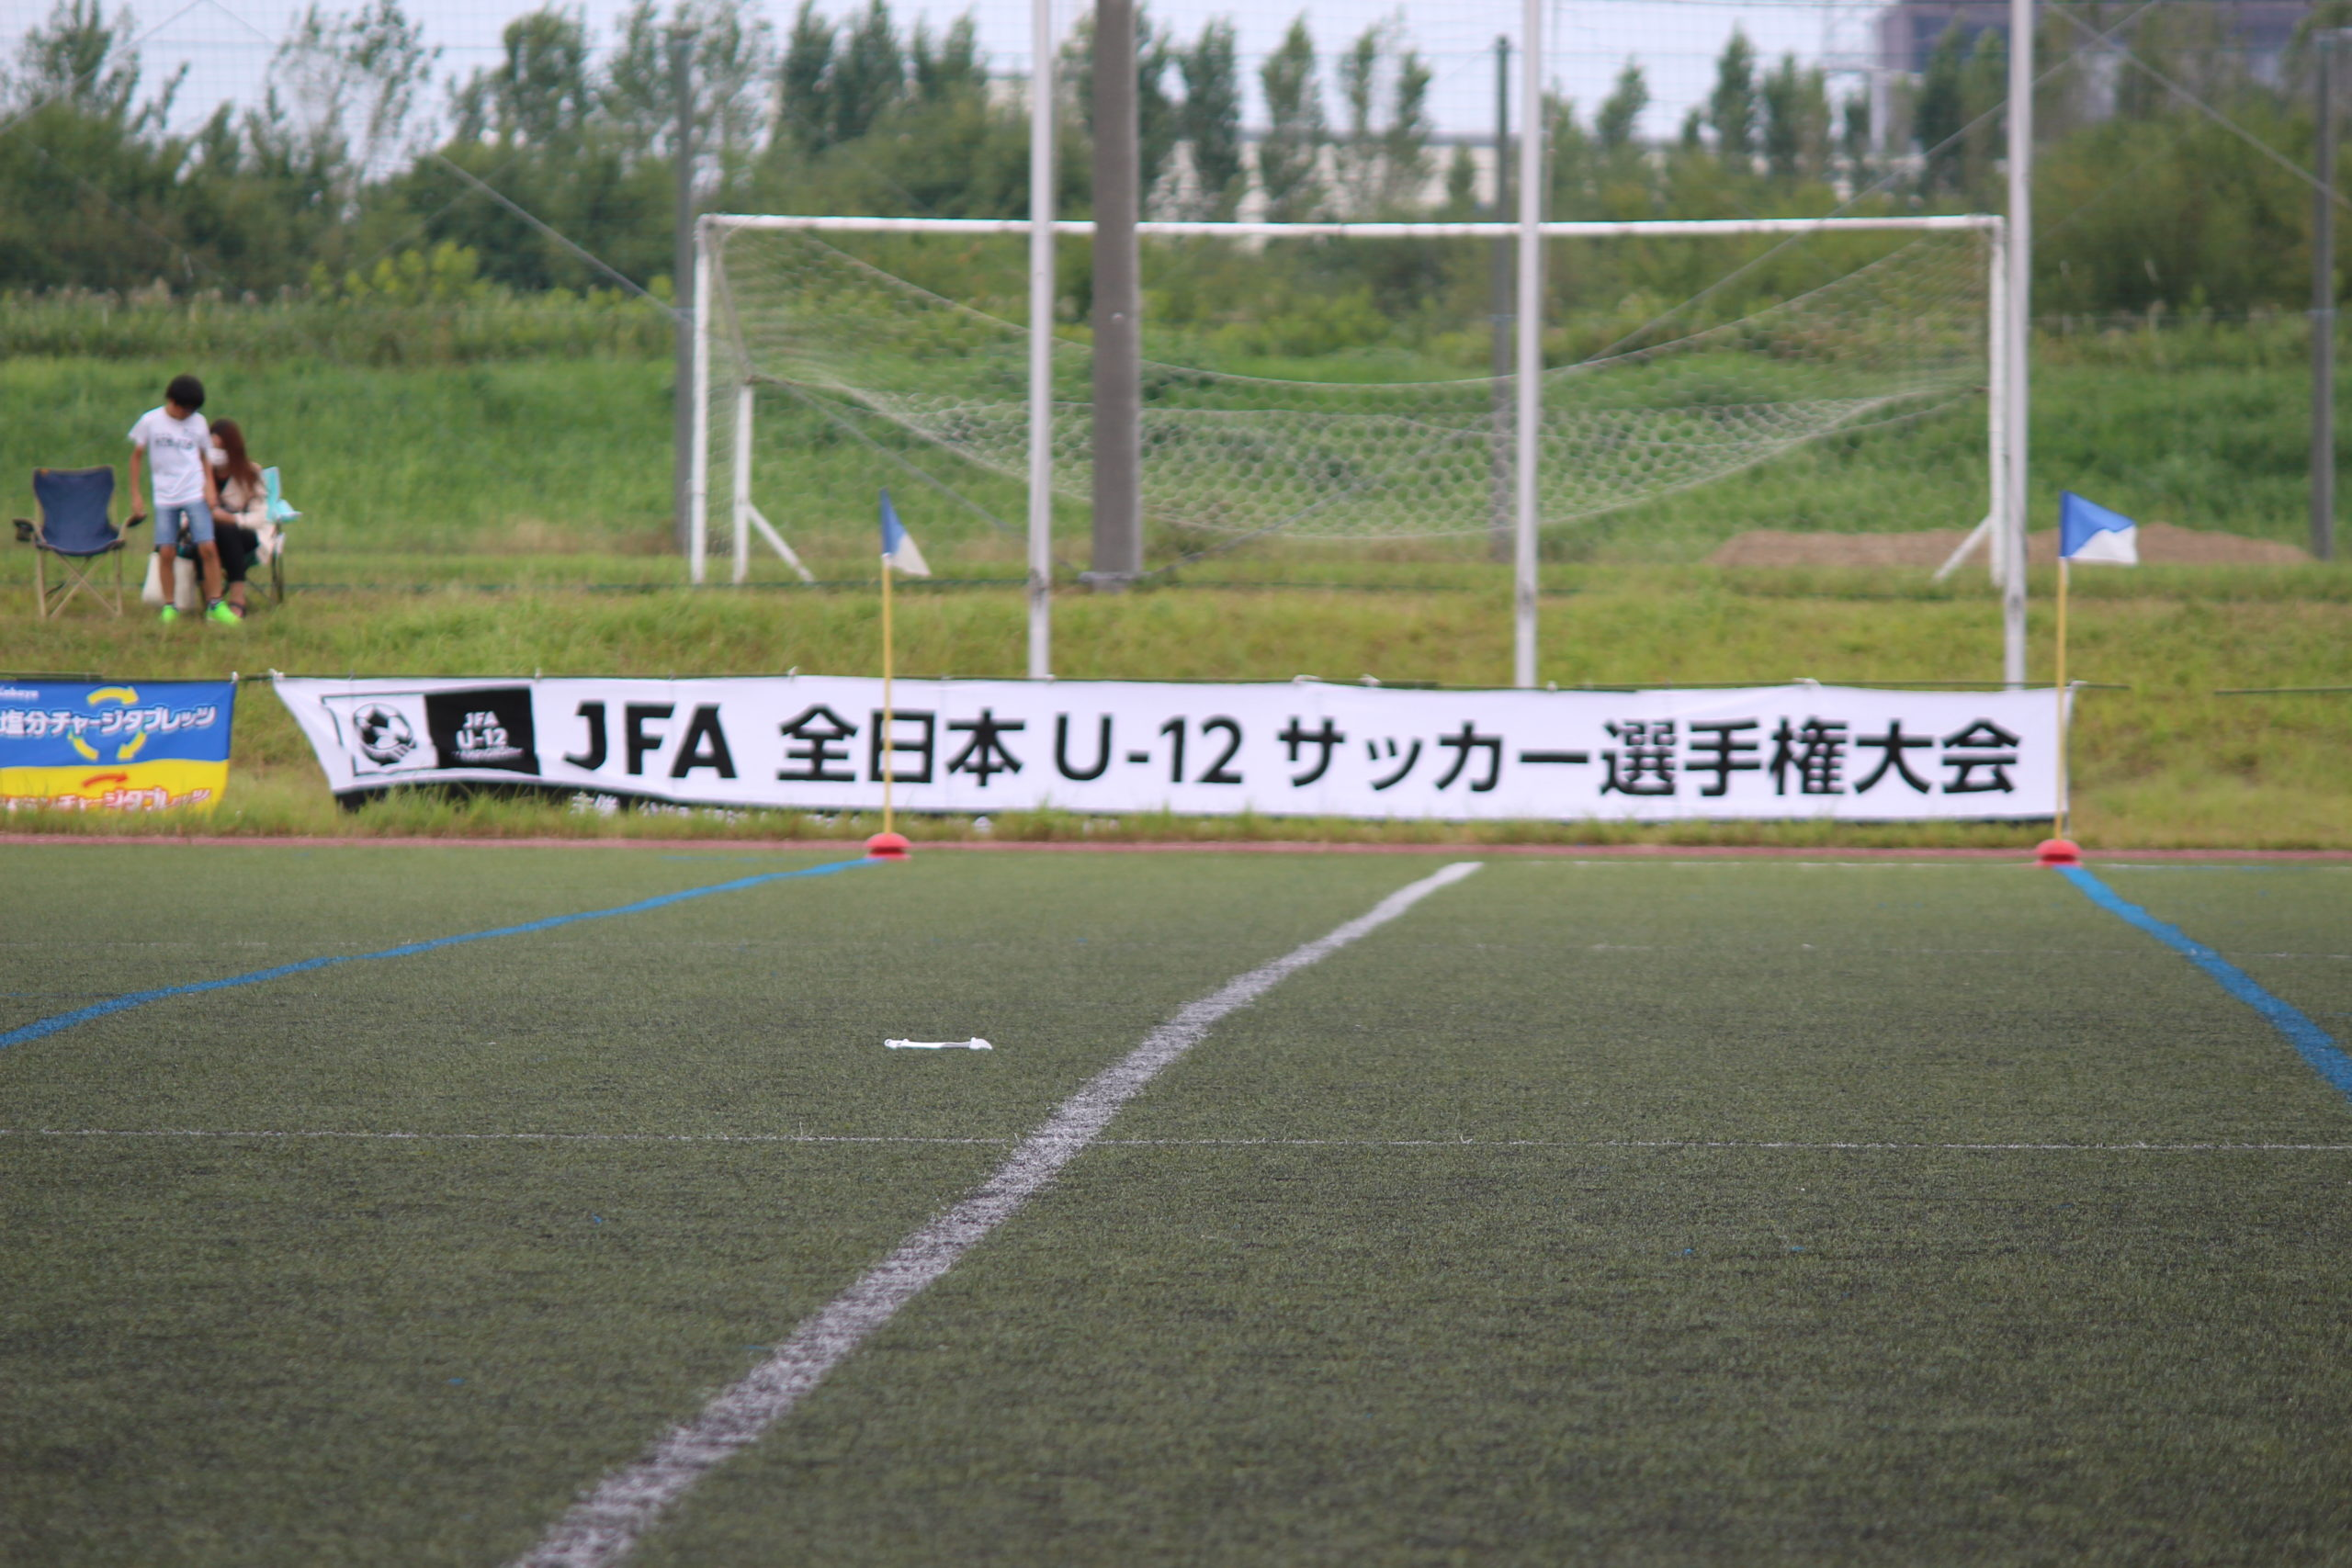 JFA第44回全日本U-12サッカー選手権大会新潟県大会新潟市予選 | 新潟市 ...